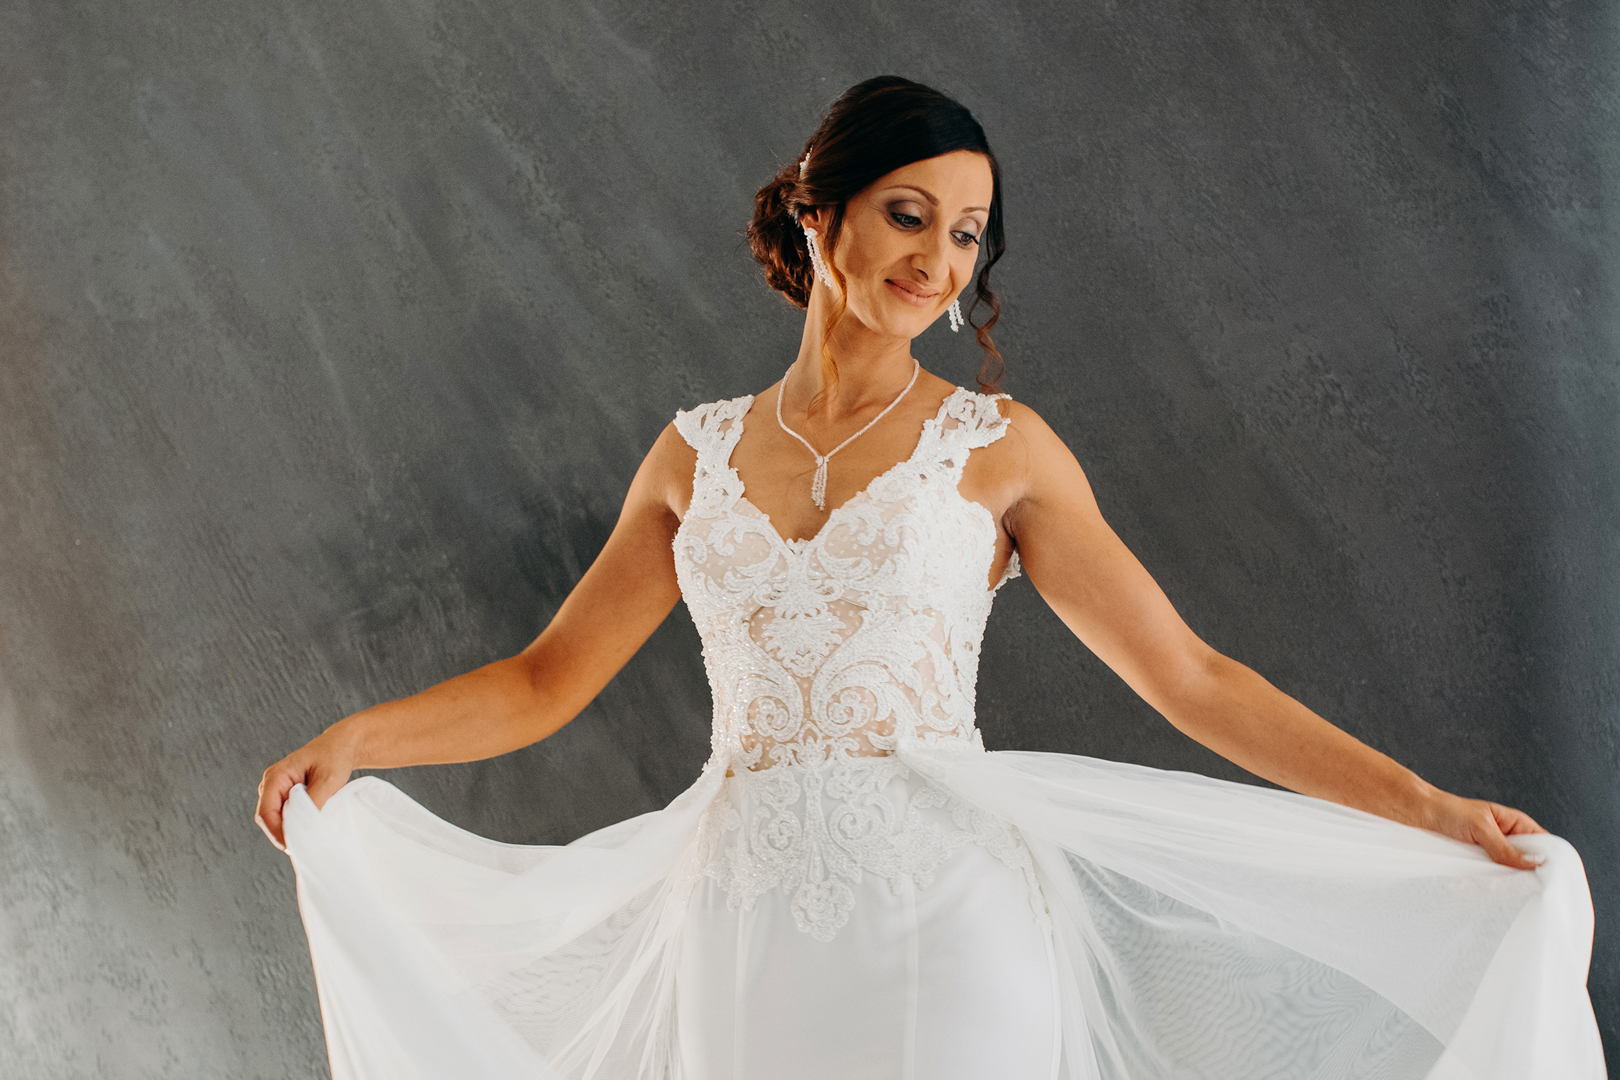 8 gianni-lepore-fotografo-abito-sposa-wedding-lucera-dress-bride-weddingday